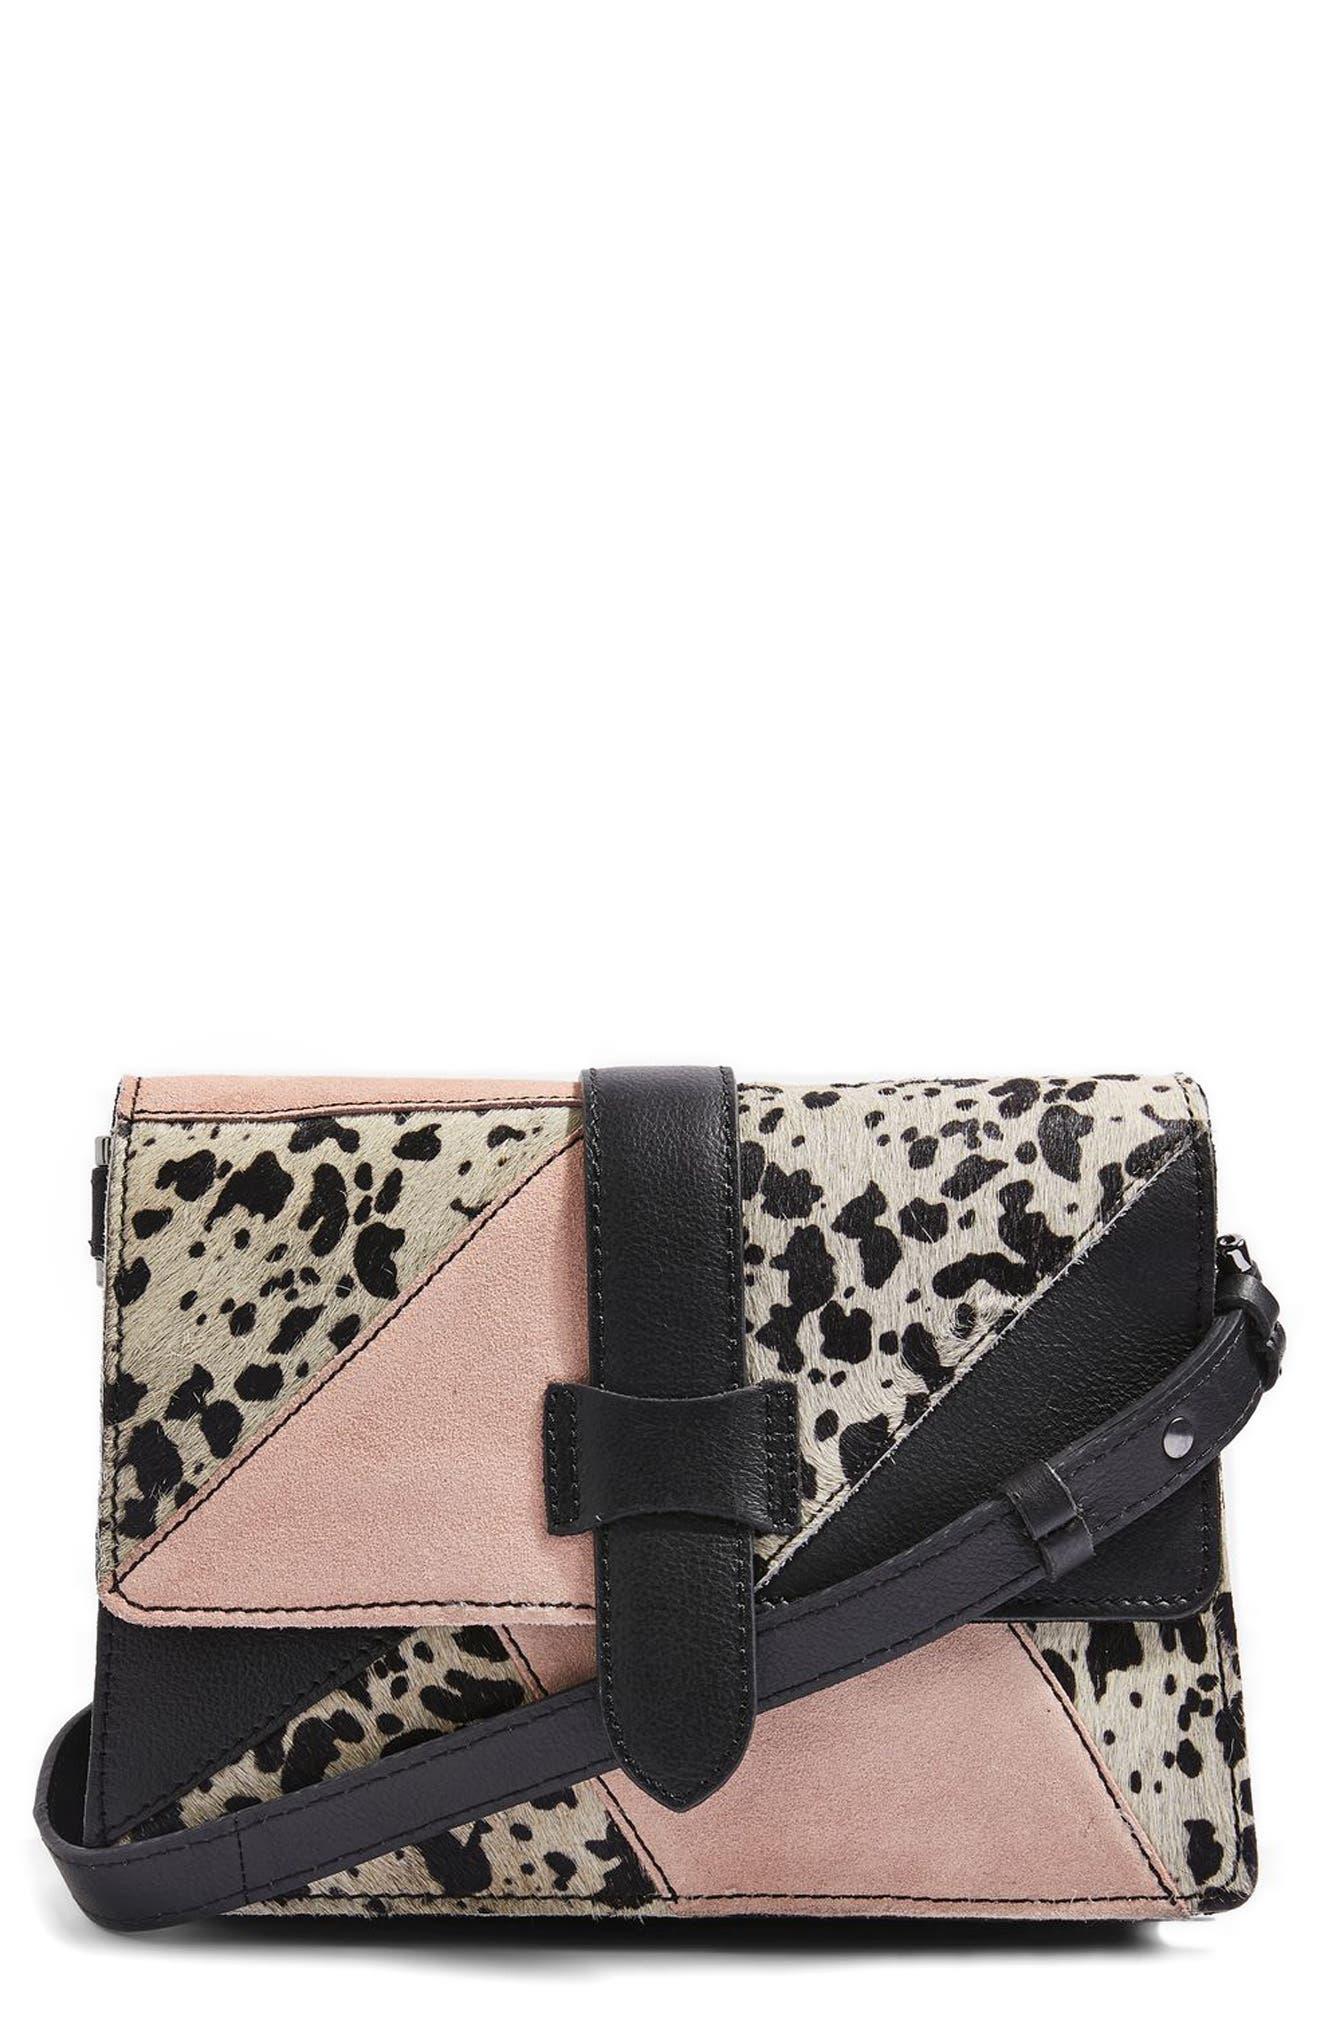 Premium Leather & Genuine Calf Hair Patchwork Crossbody Bag,                             Main thumbnail 1, color,                             001